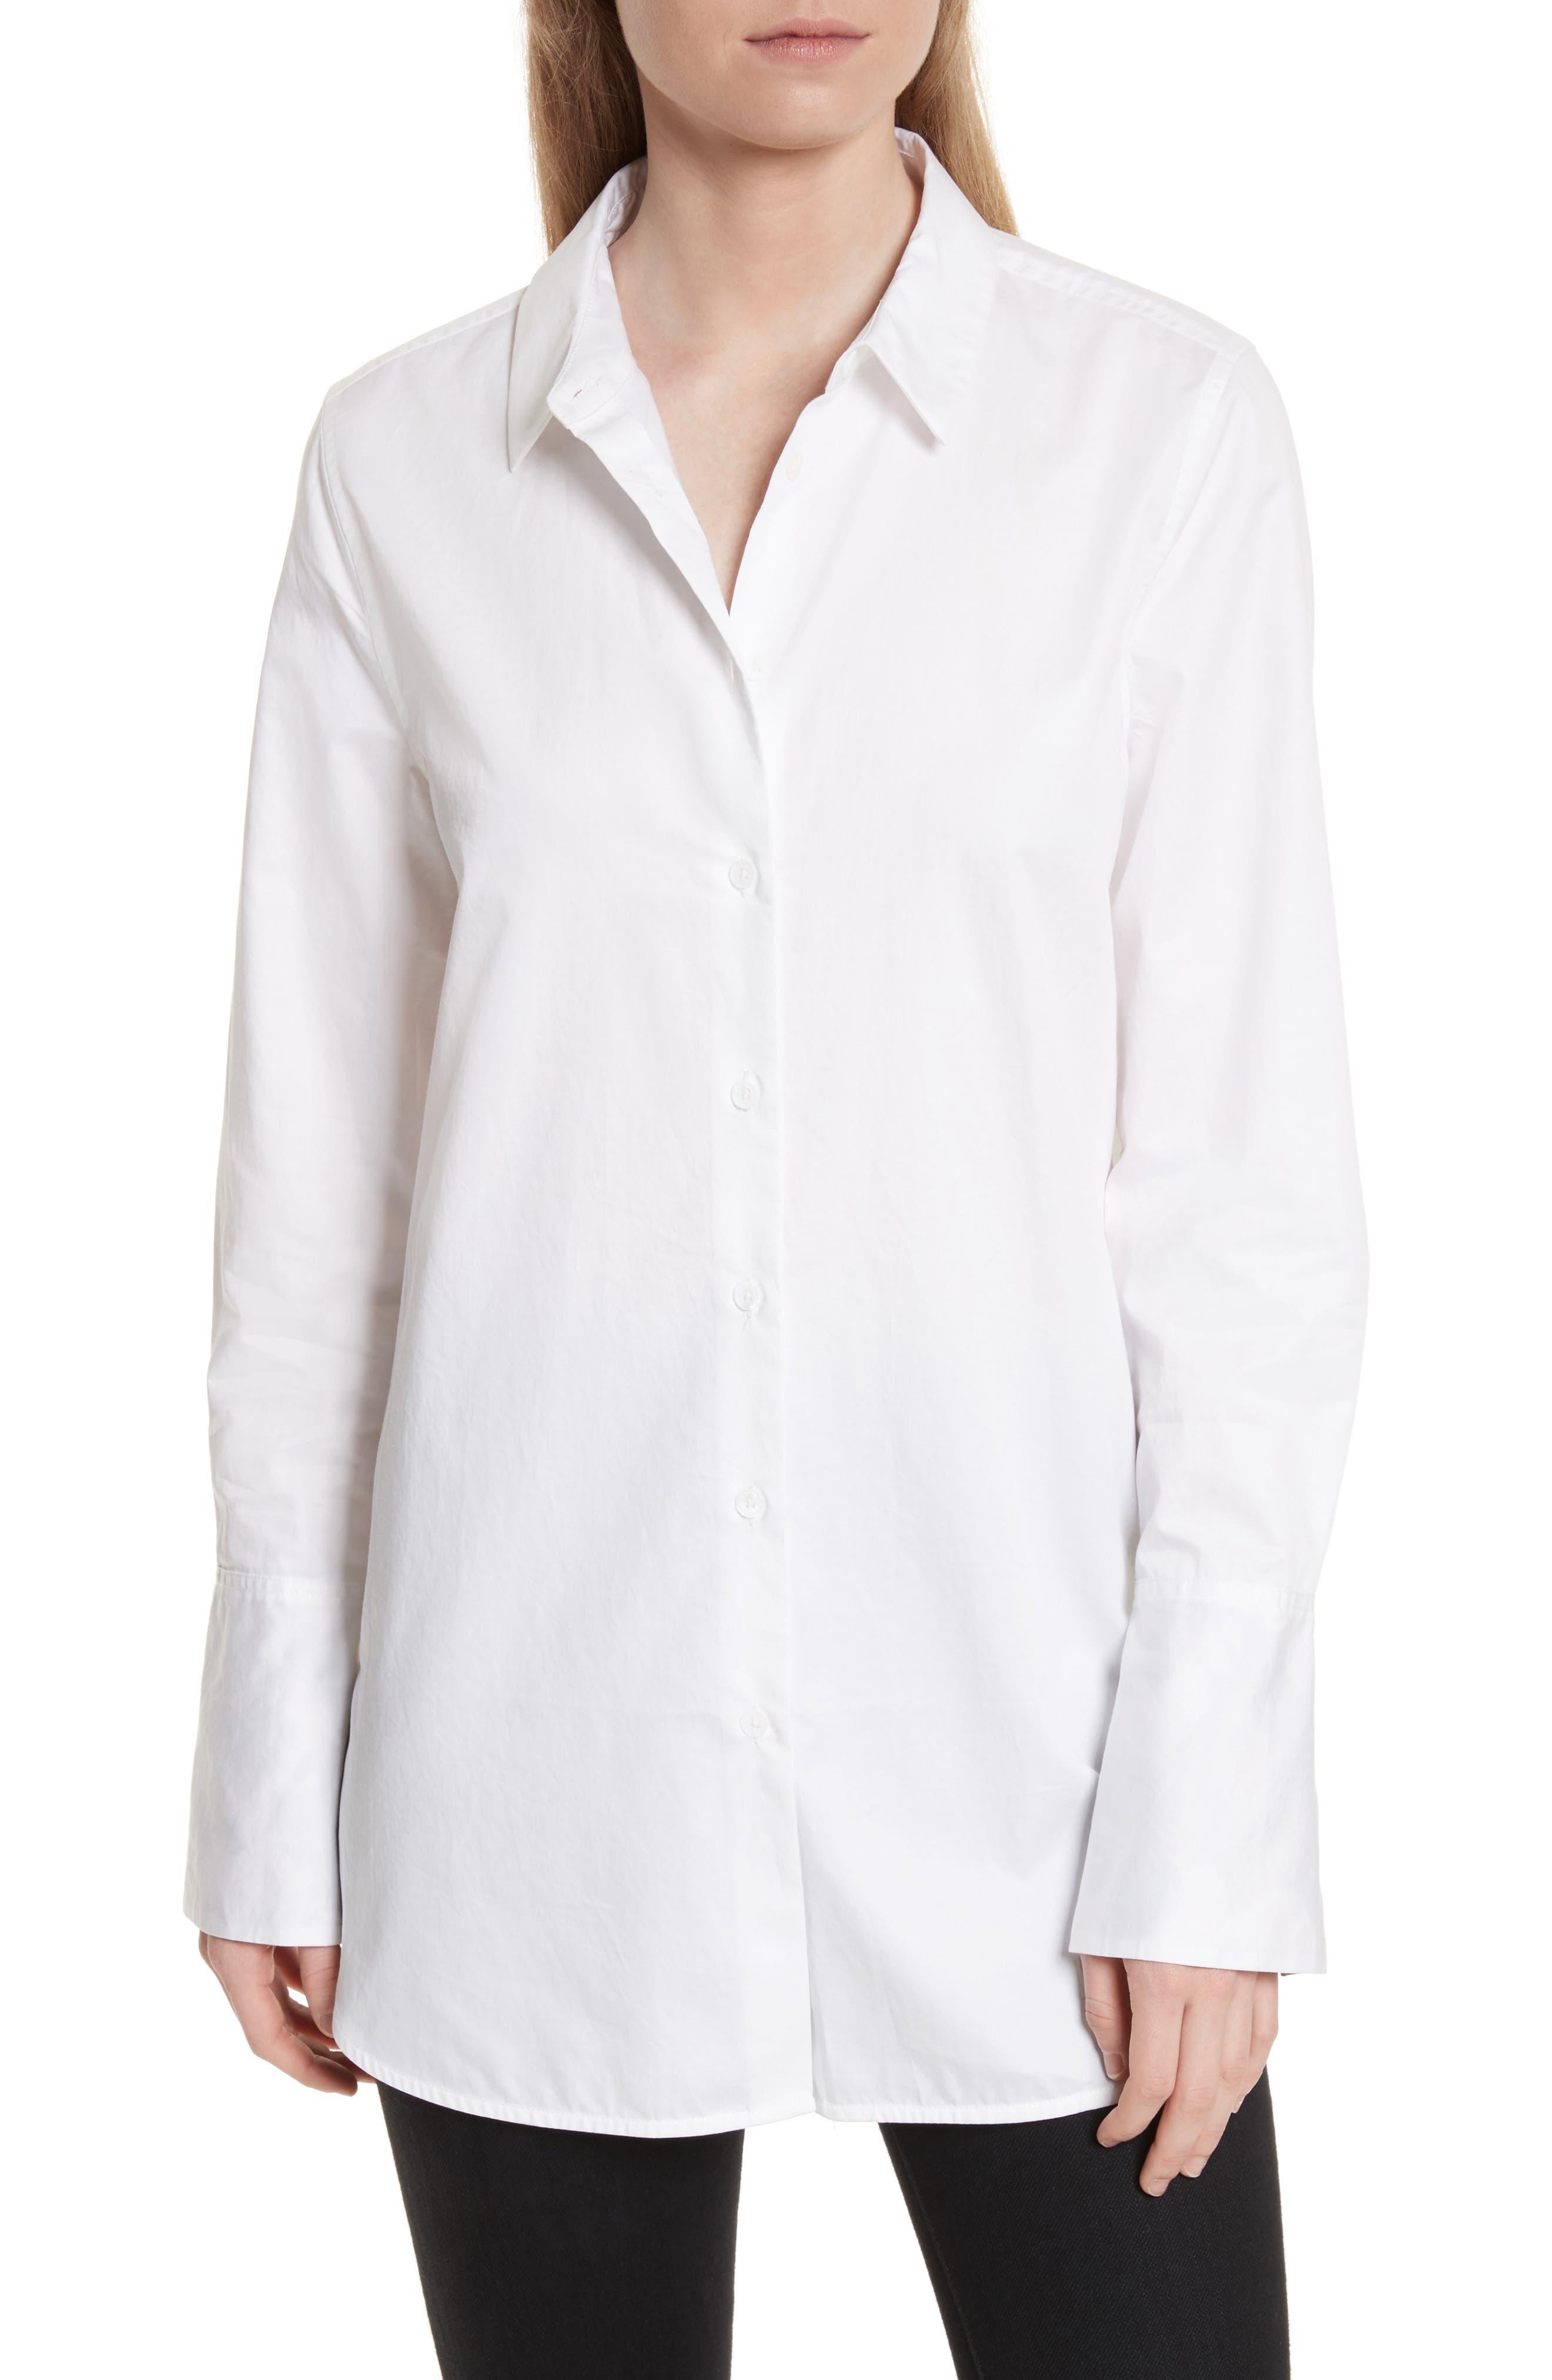 Arlette Cotton Shirt,                             Main thumbnail 1, color,                             Bright White